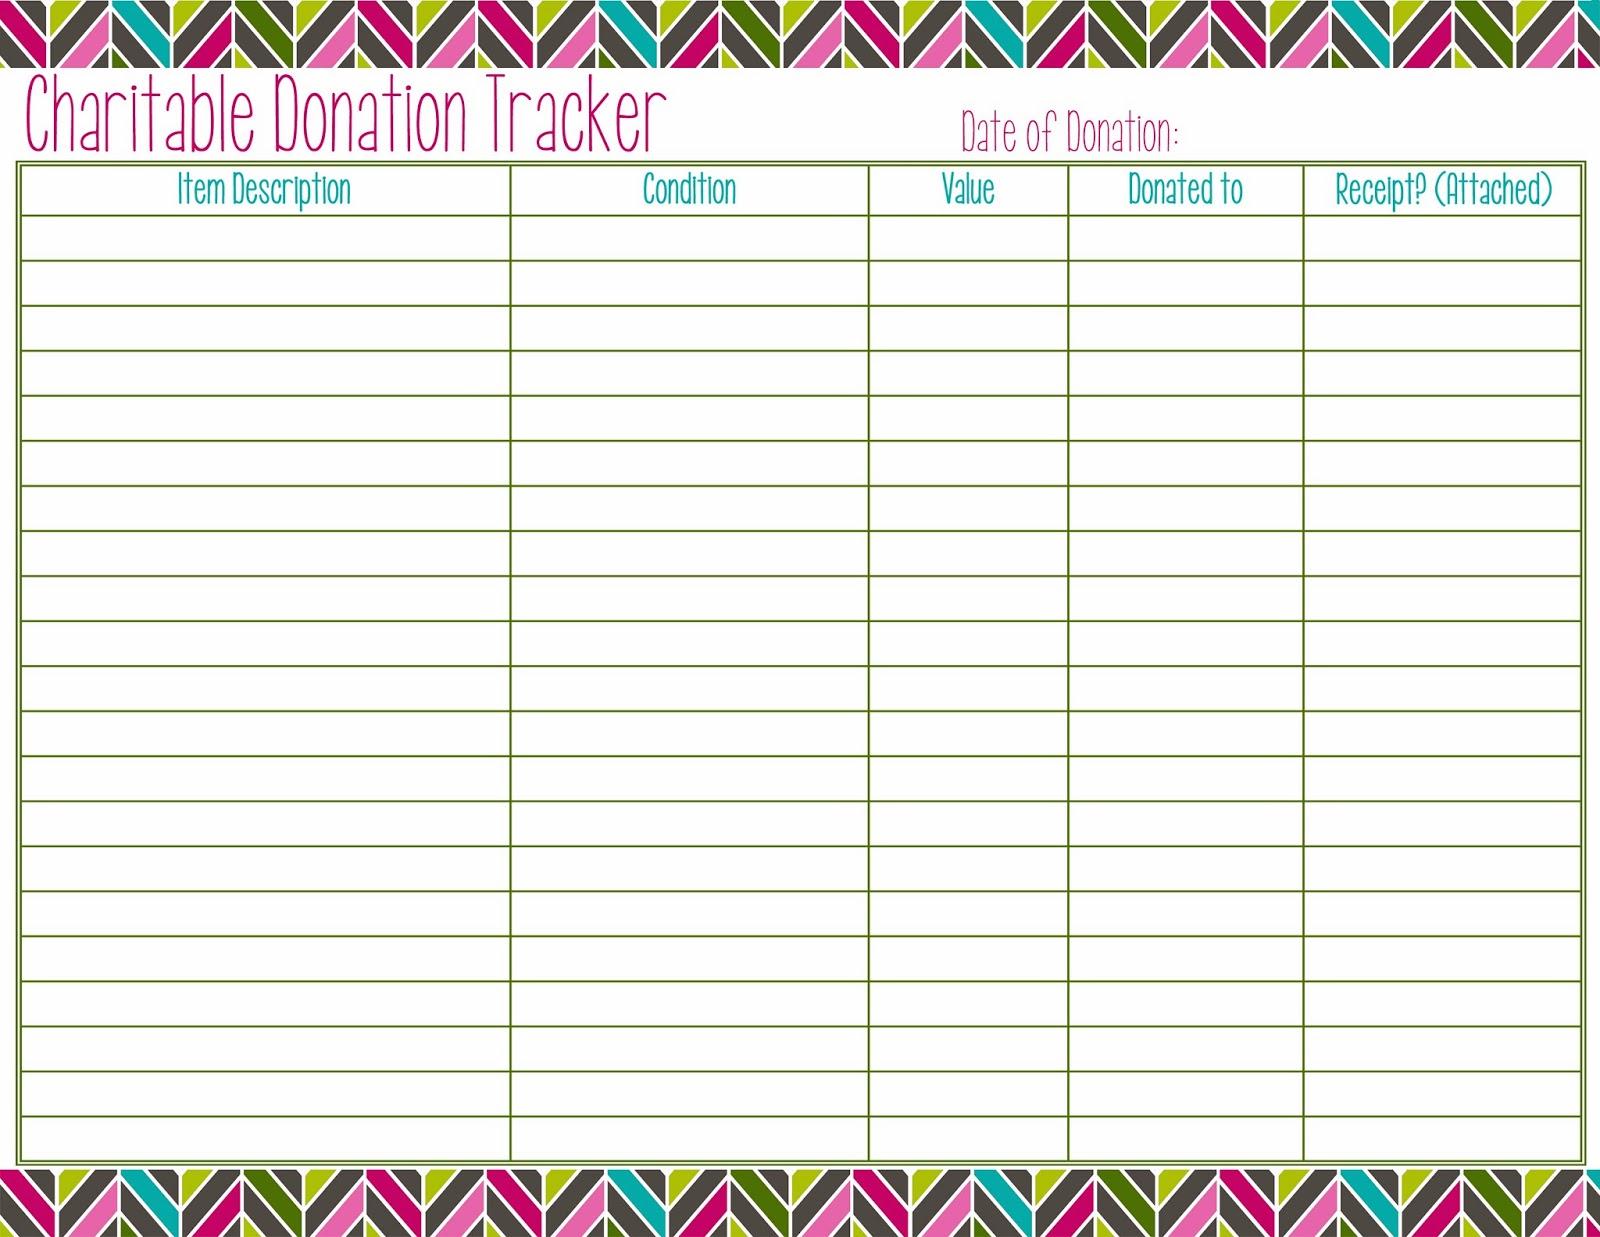 Organize Your Move Charitable Donation Tracker